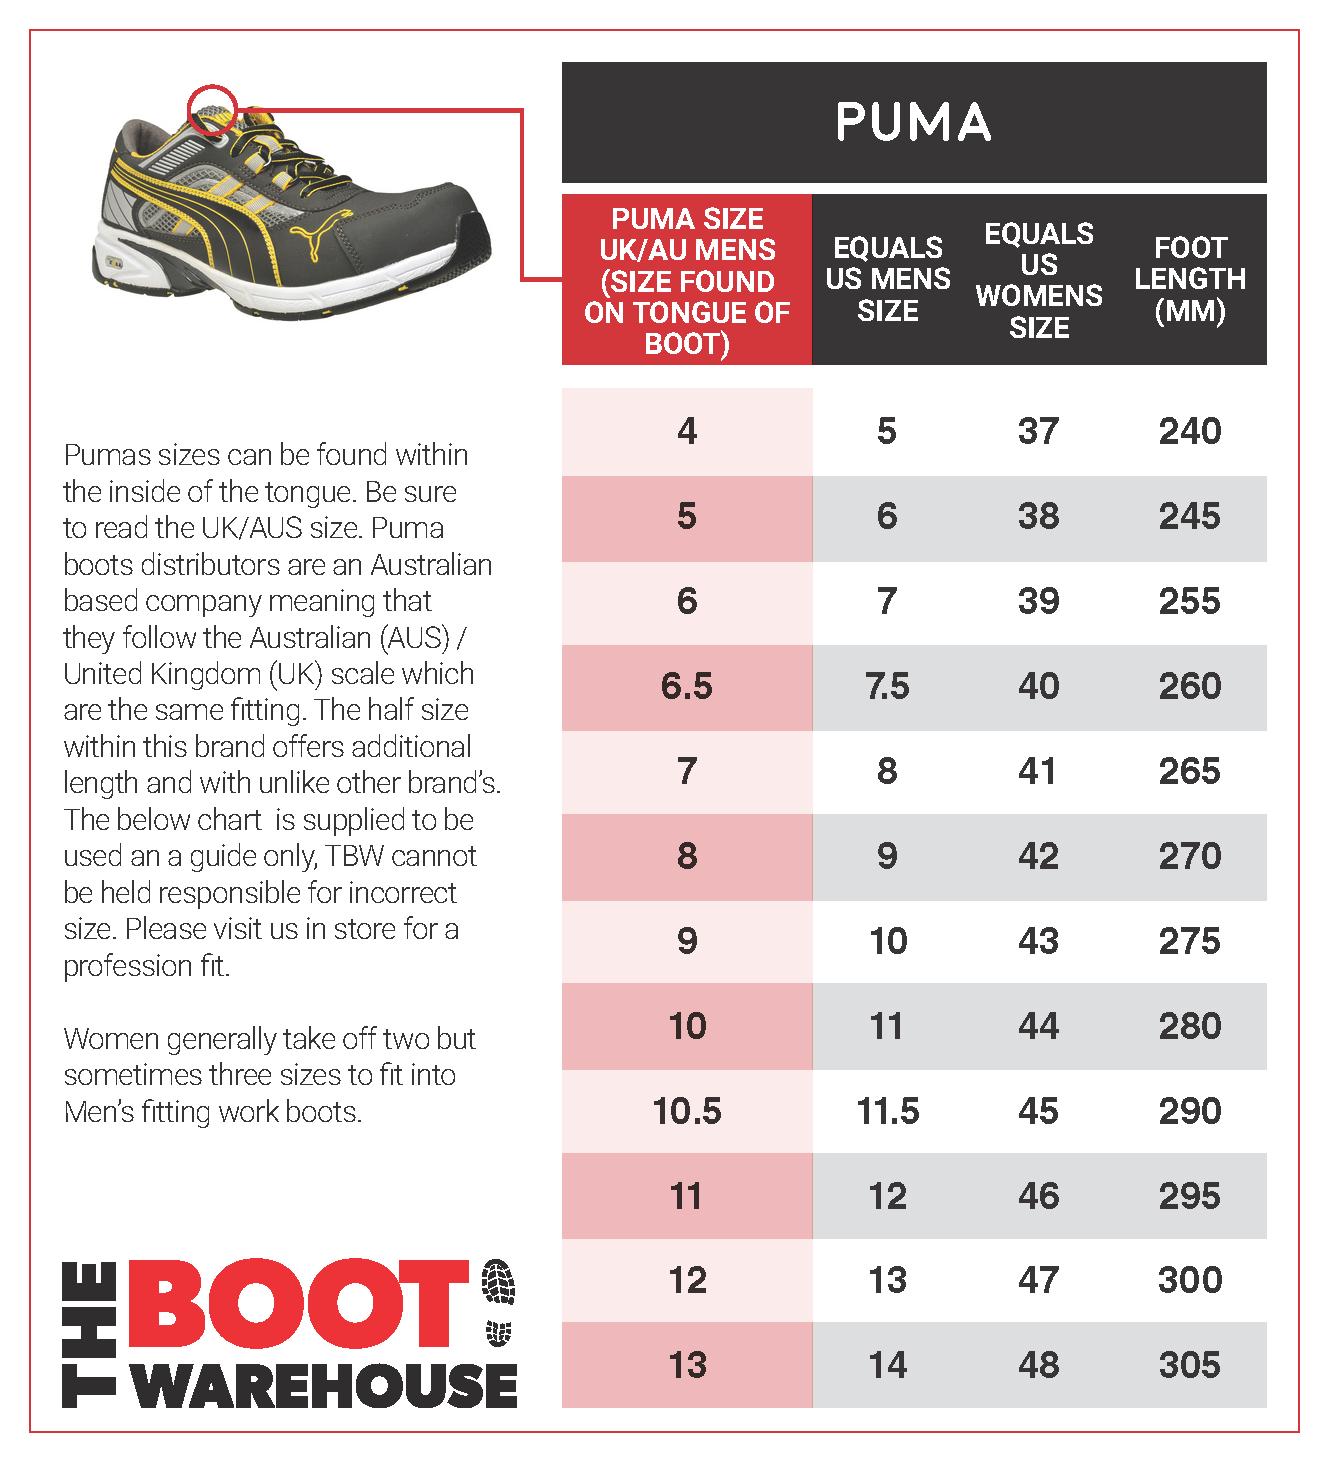 puma size guide